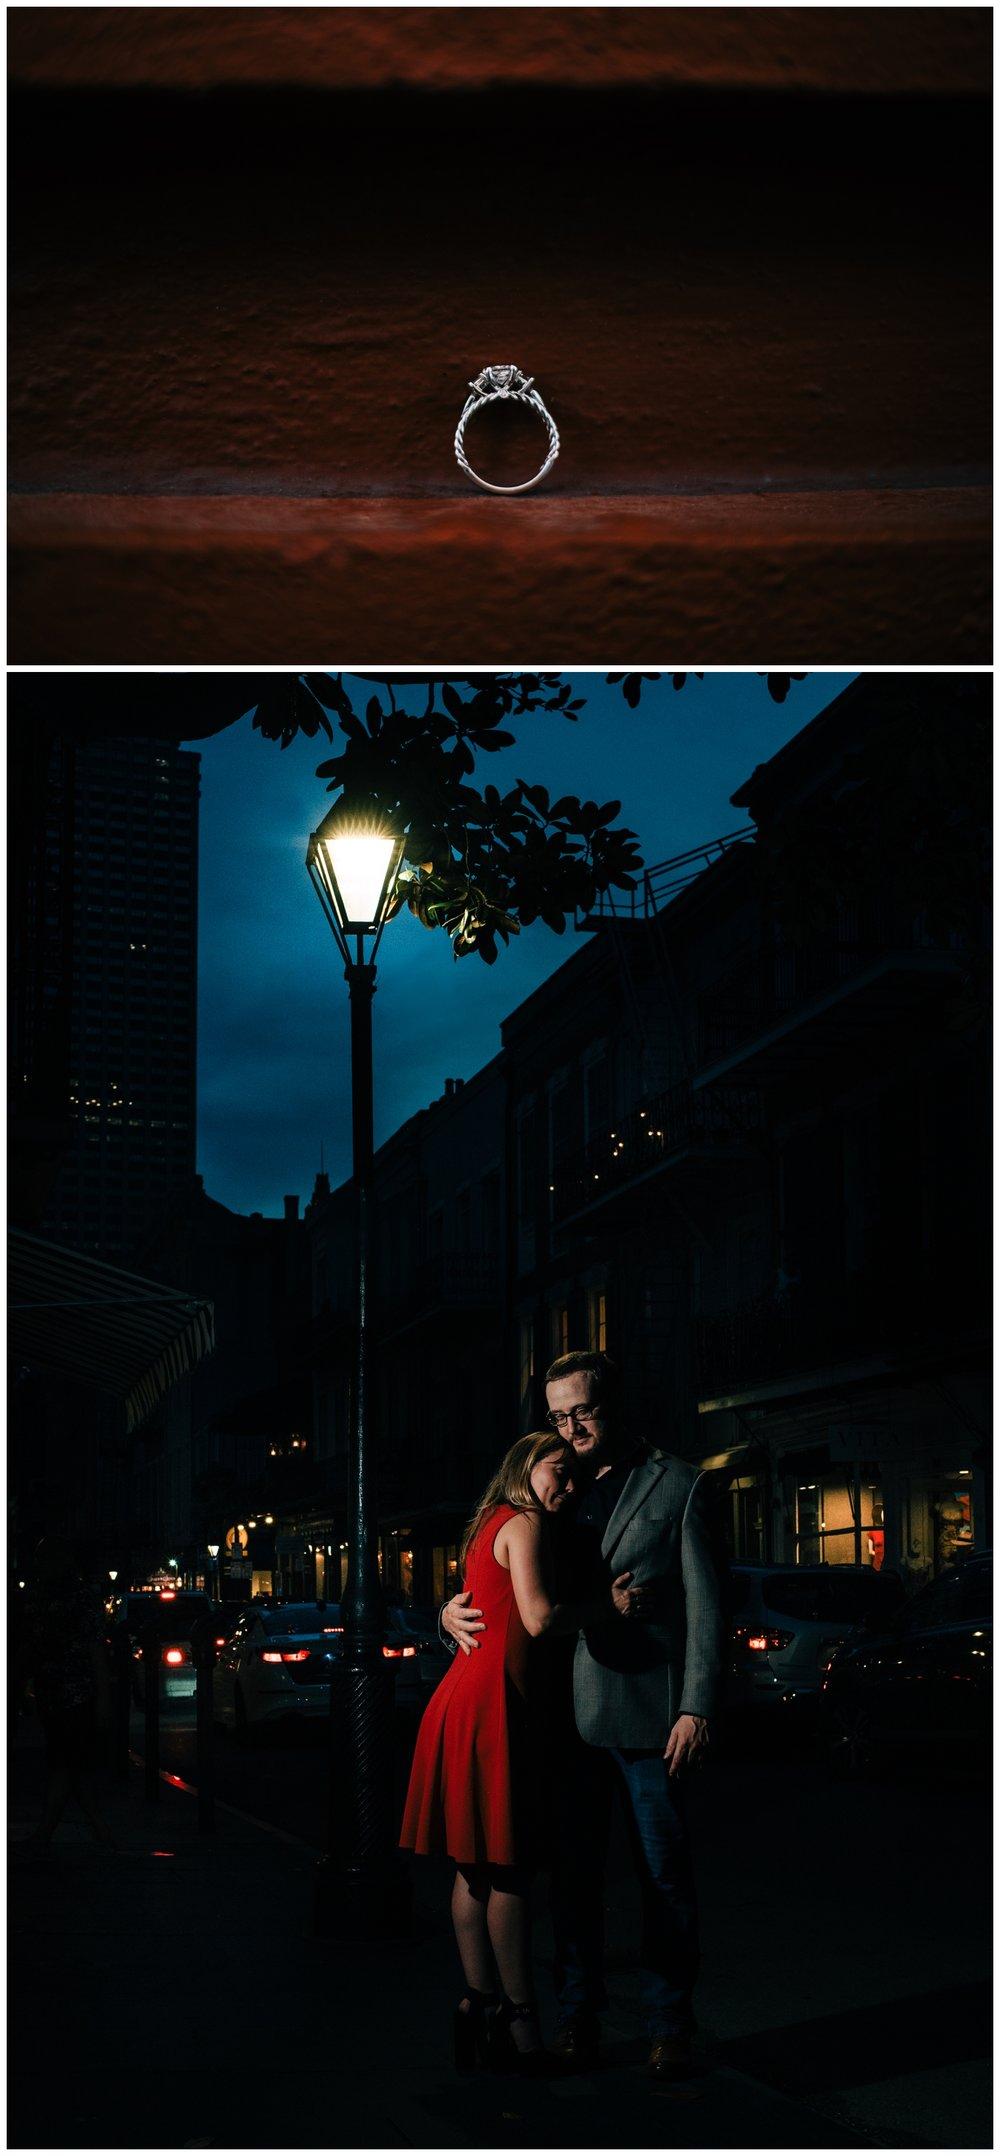 New-Orleans-family-photography- french-quarter-kallistia-photography_0025.jpg